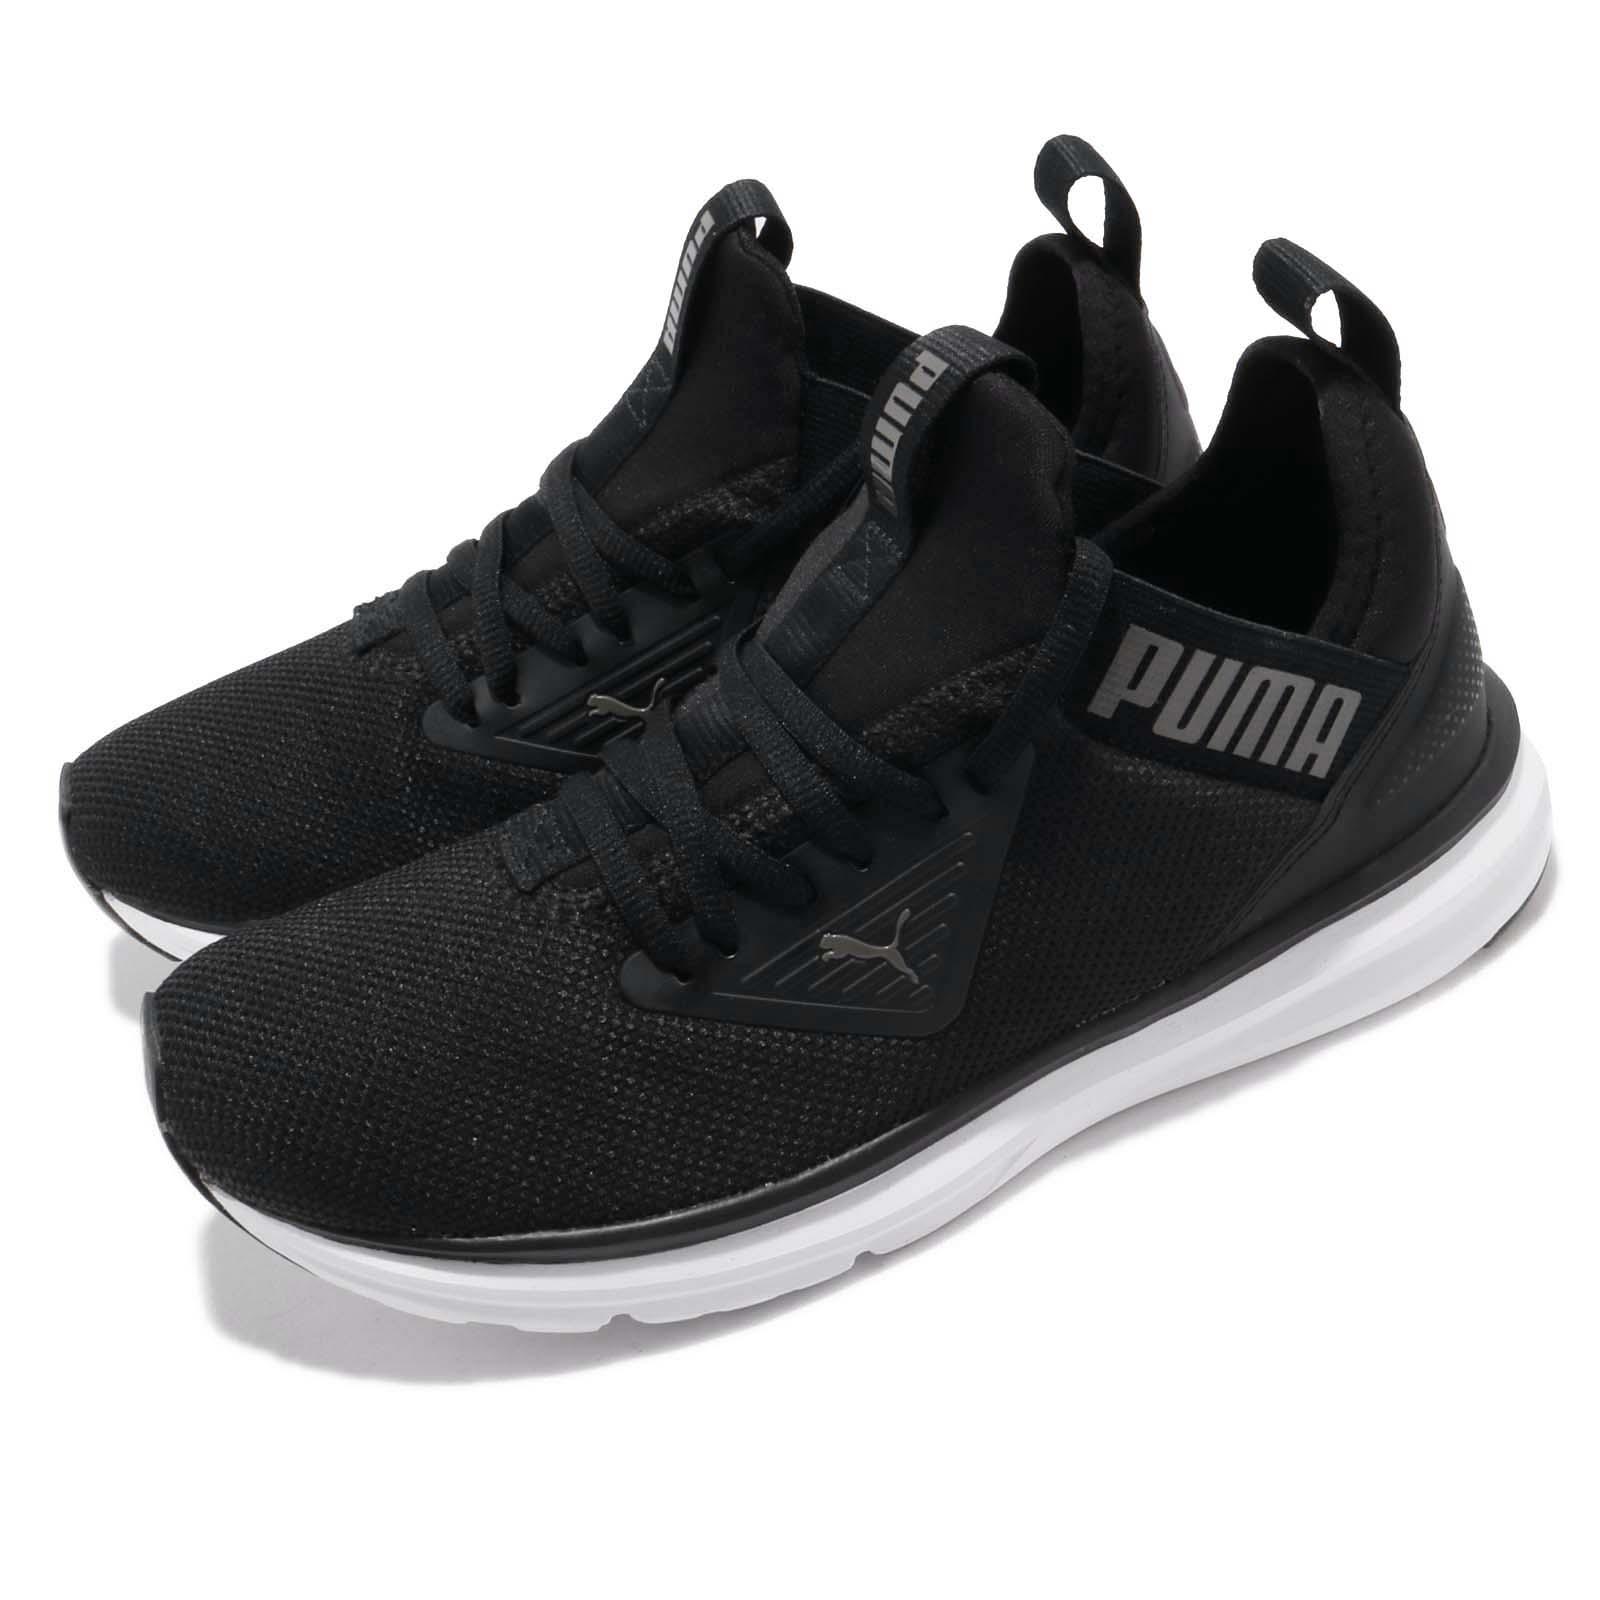 Puma 訓練鞋 Enzo Beta 襪套 運動 女鞋 19244304